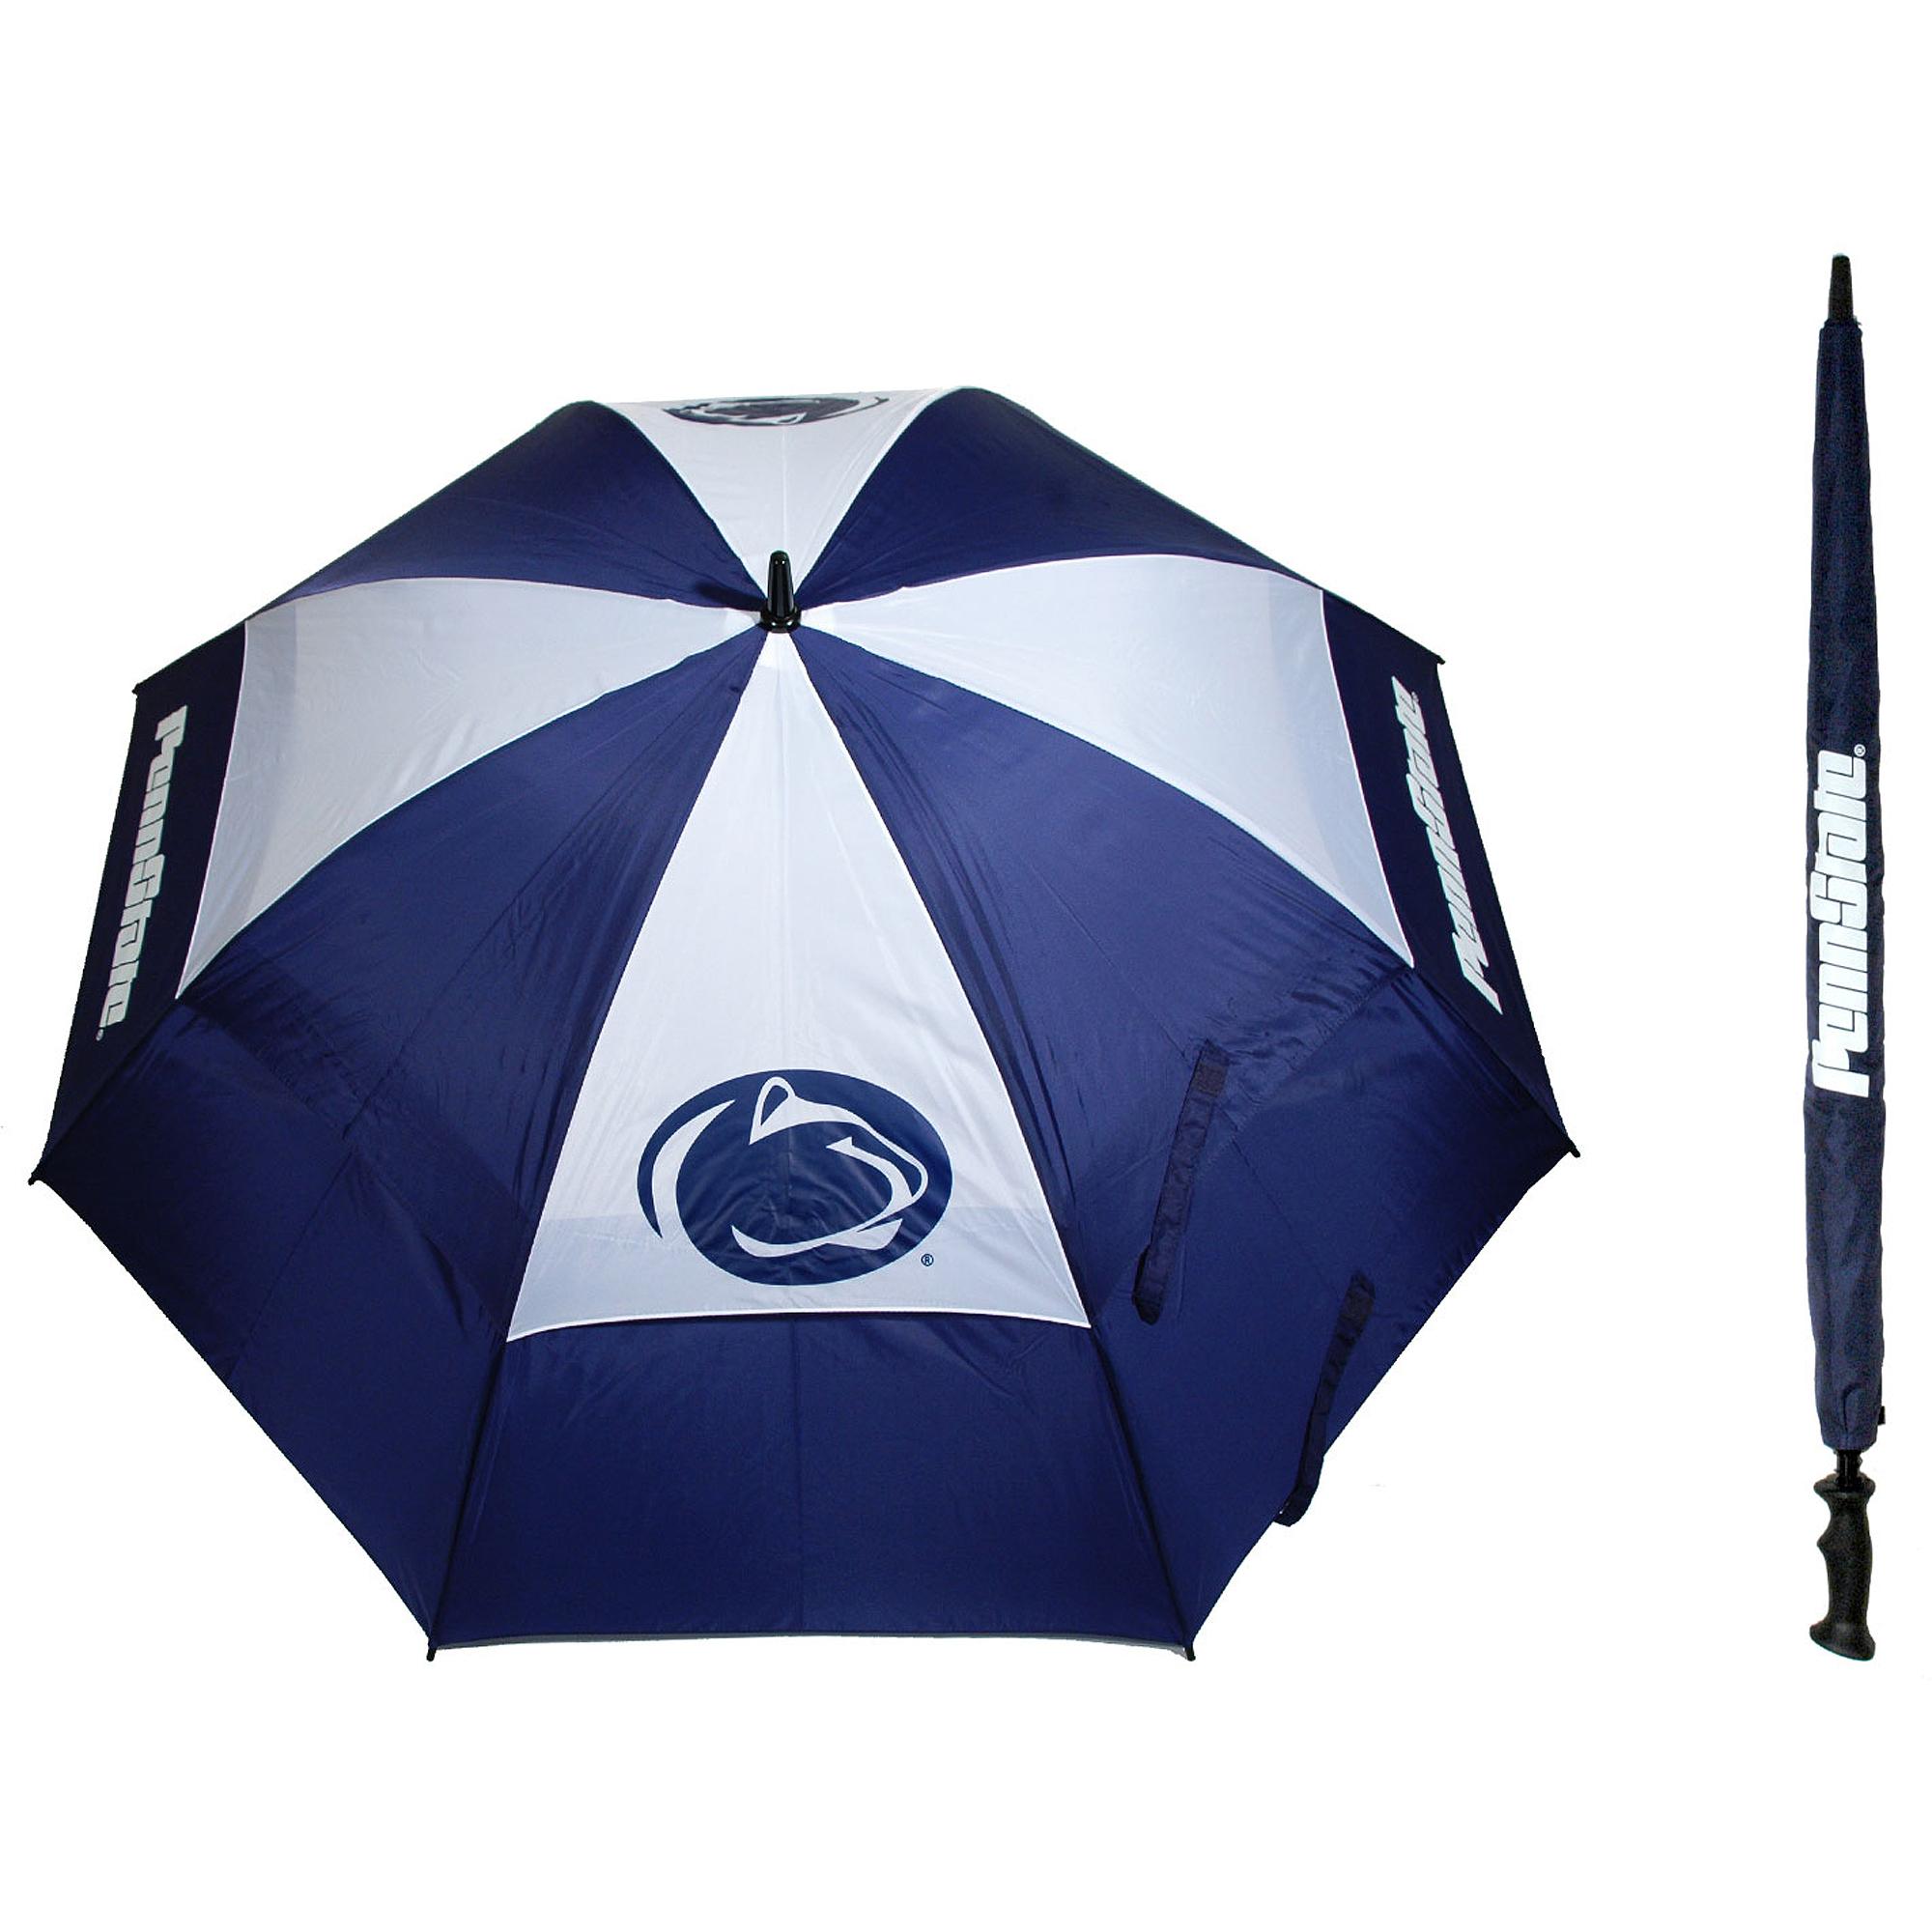 Penn State University Umbrella